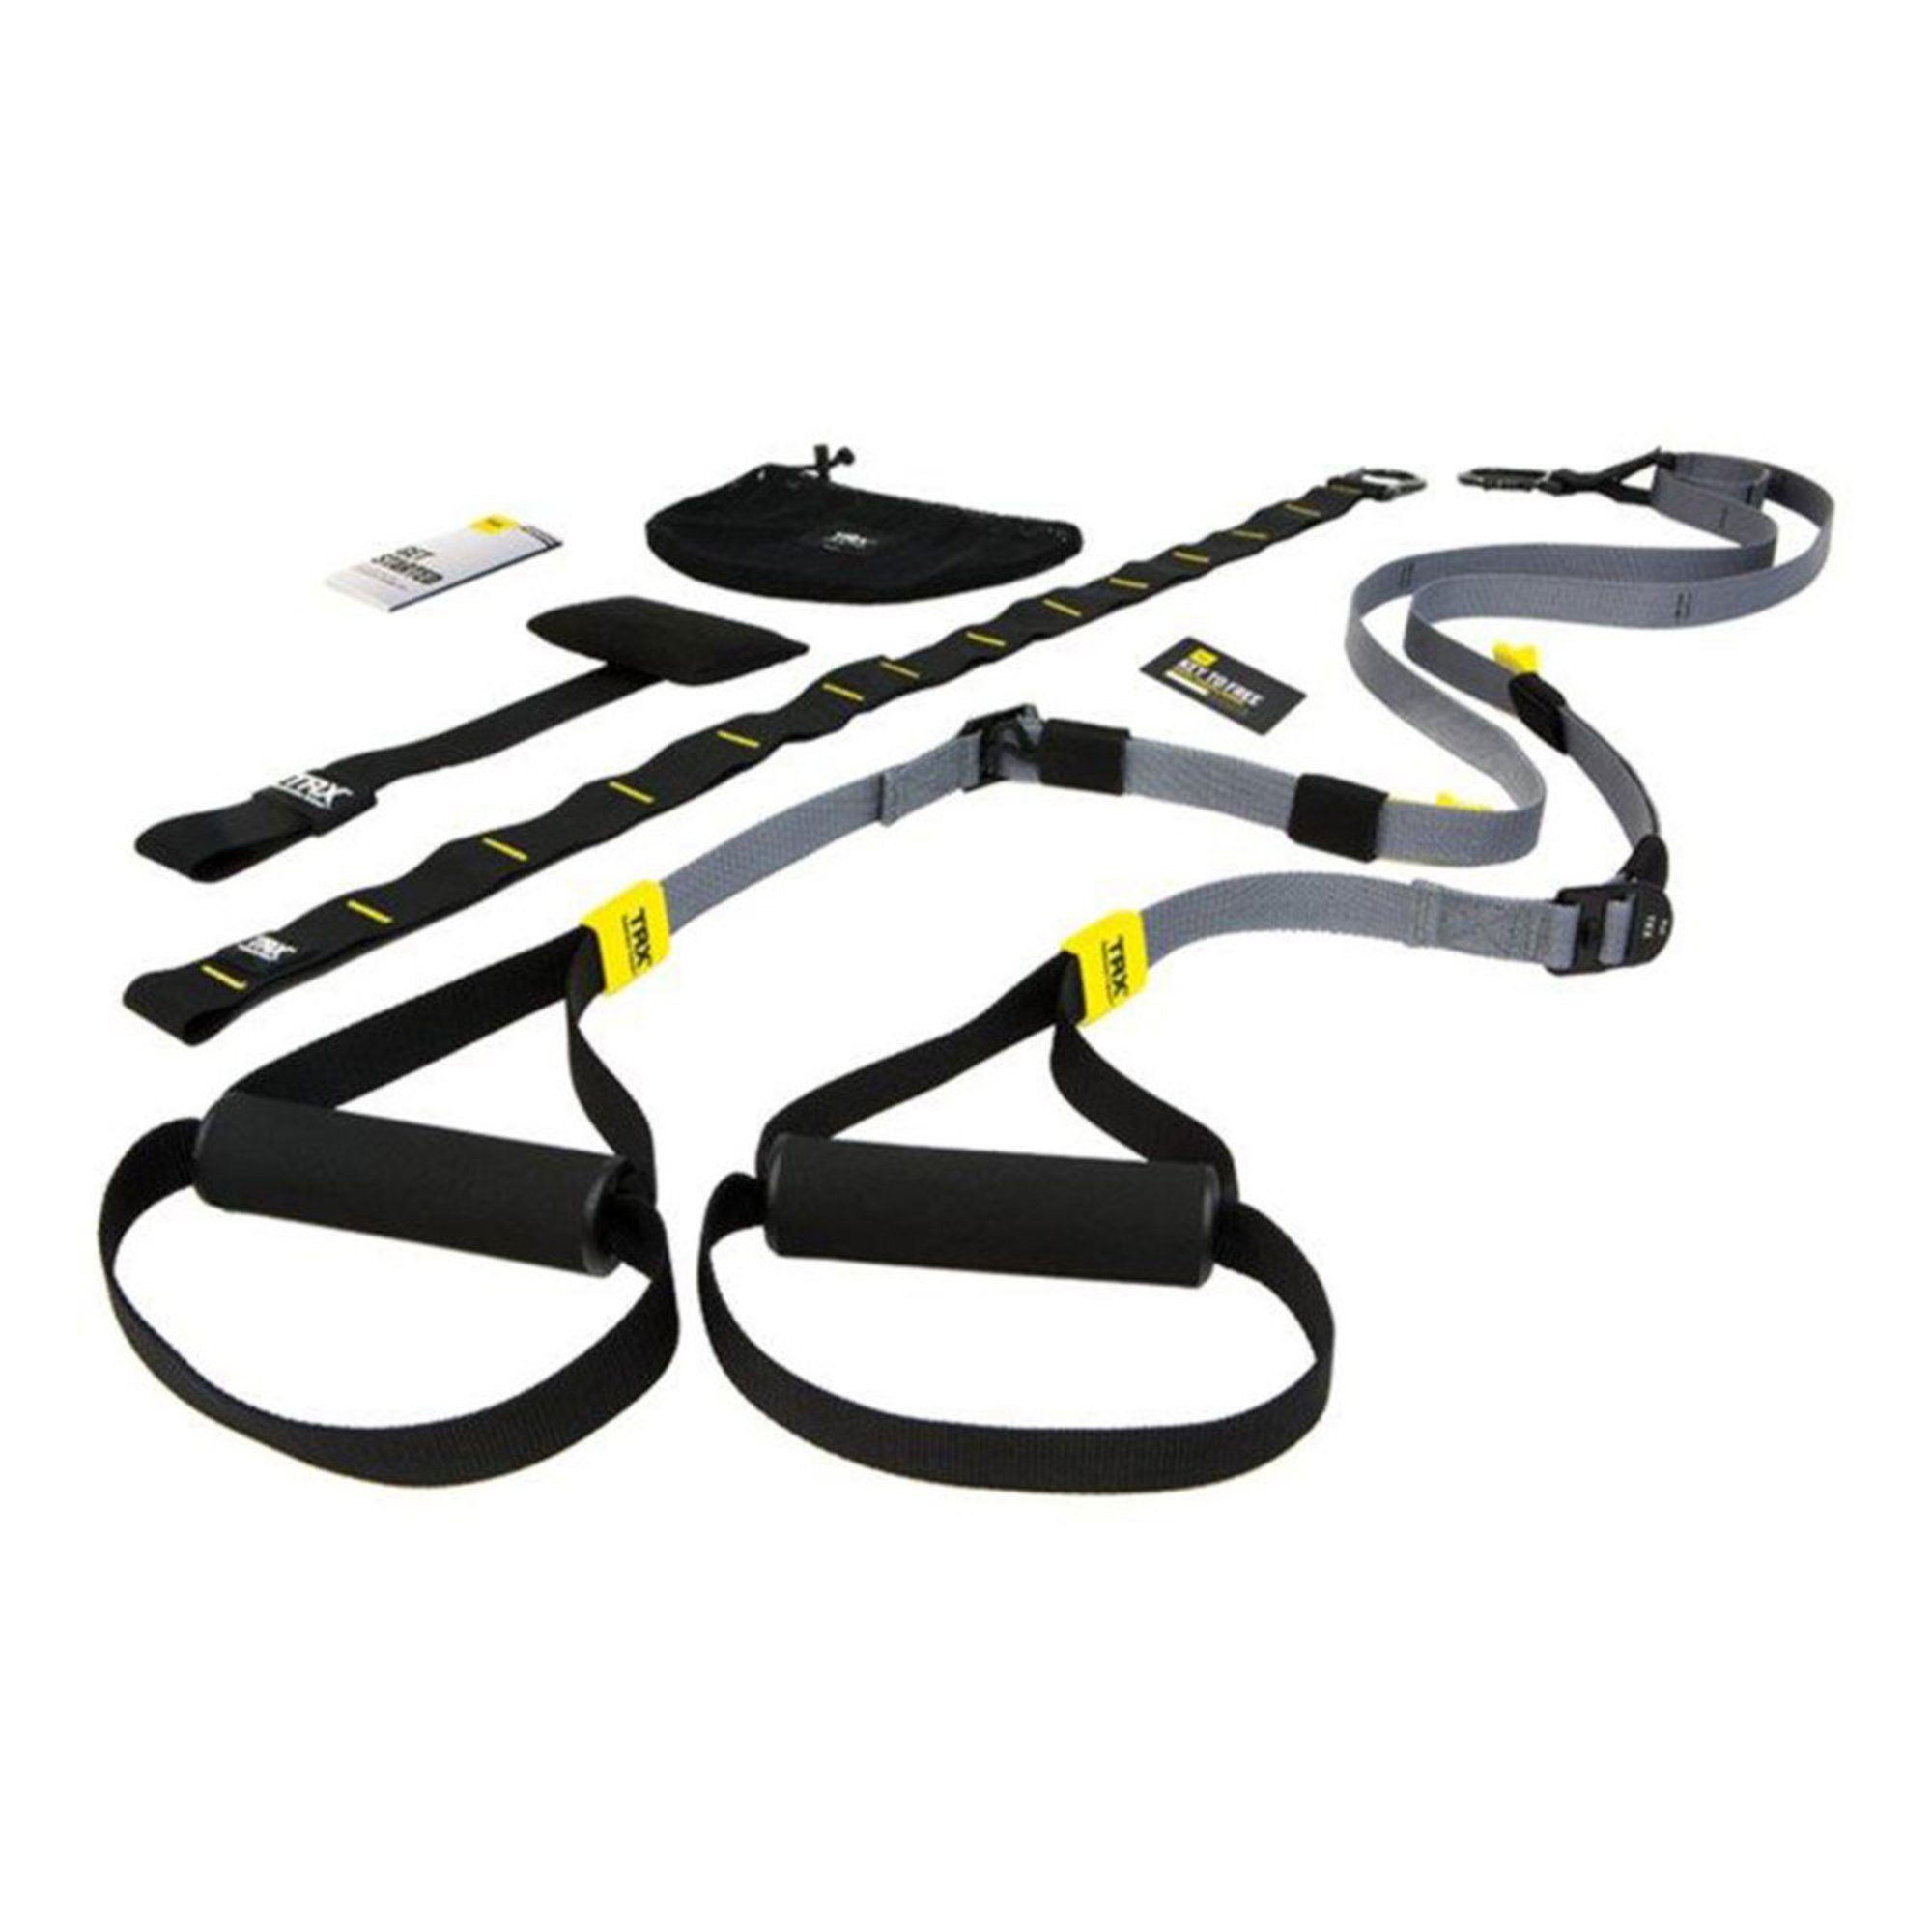 Trx Trainer For Sale: Trx Fit Suspension Trainer System